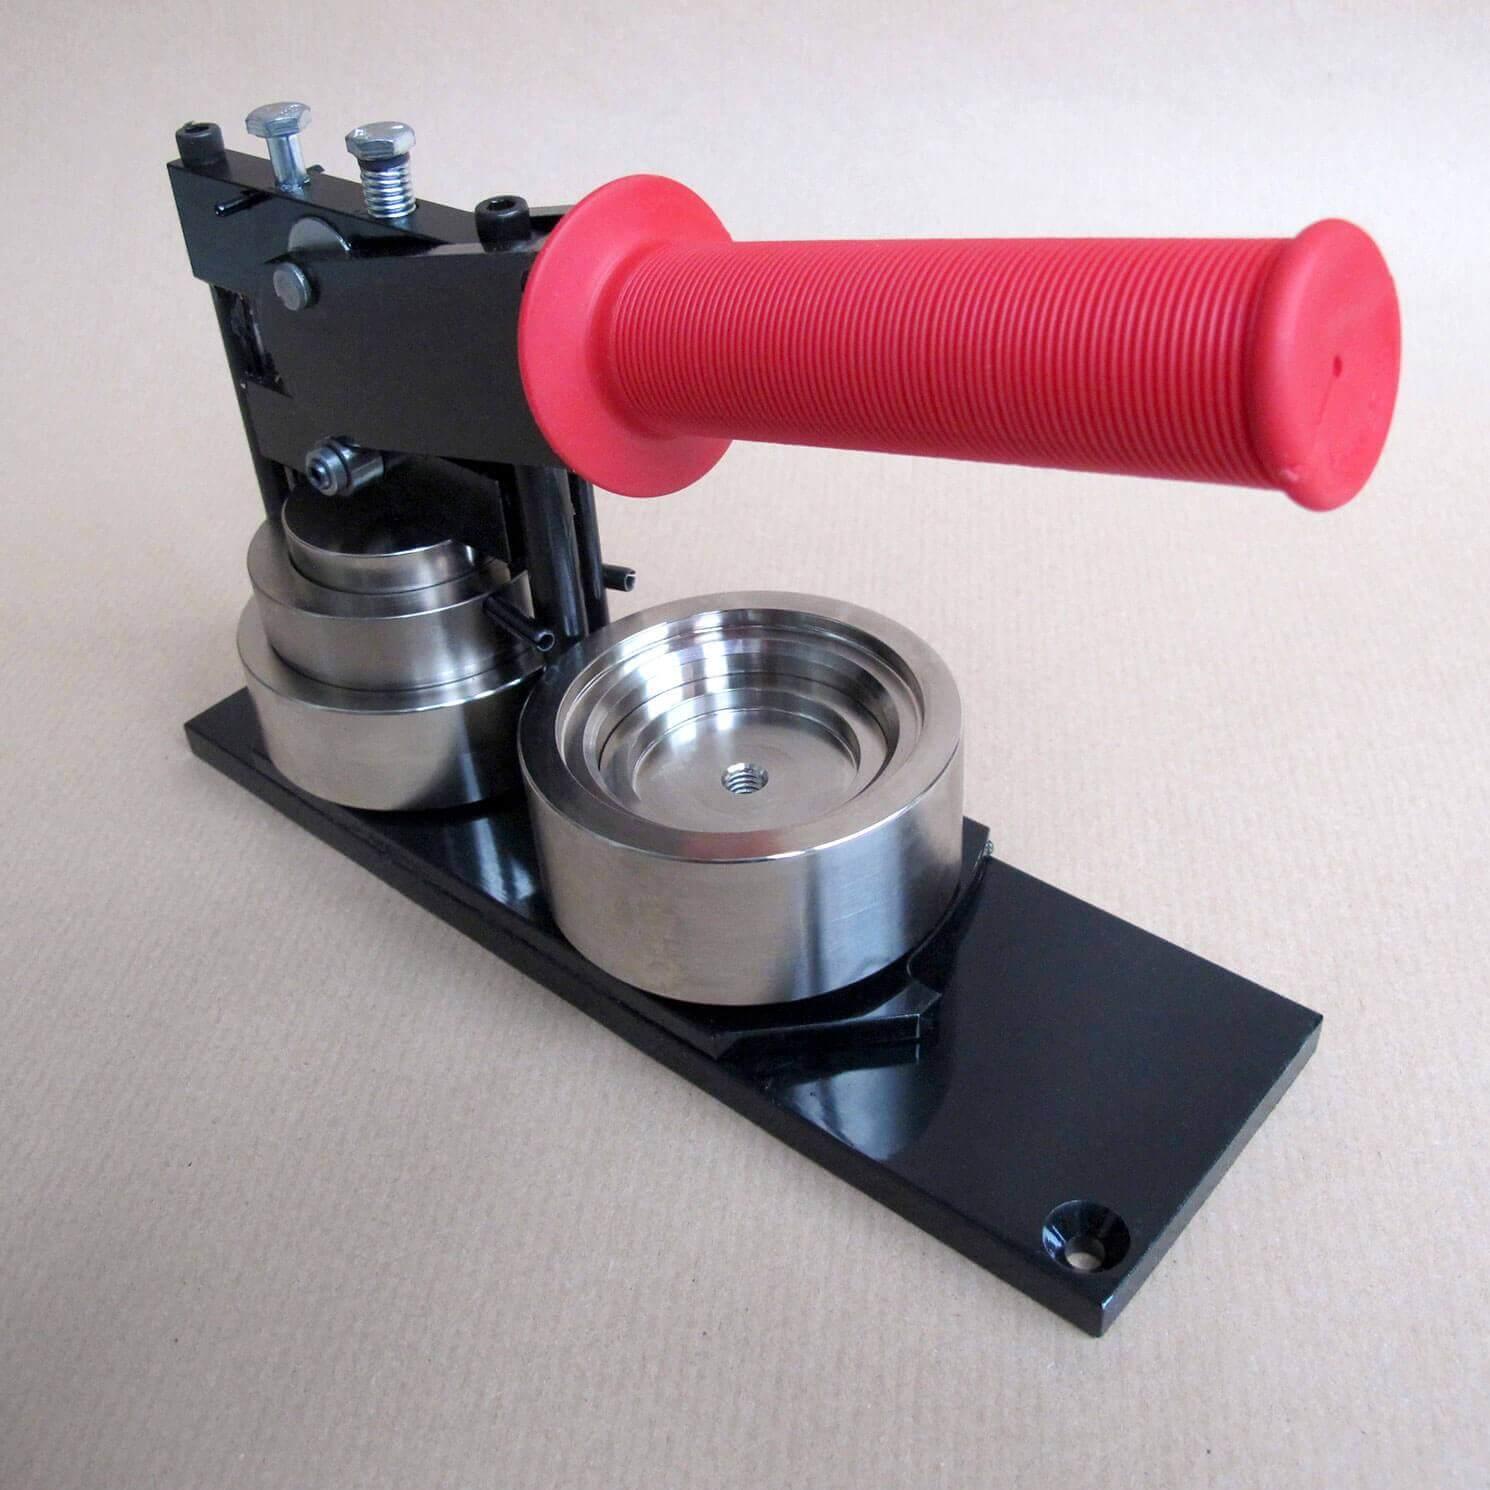 Buttonmaschine für 56mm Buttons